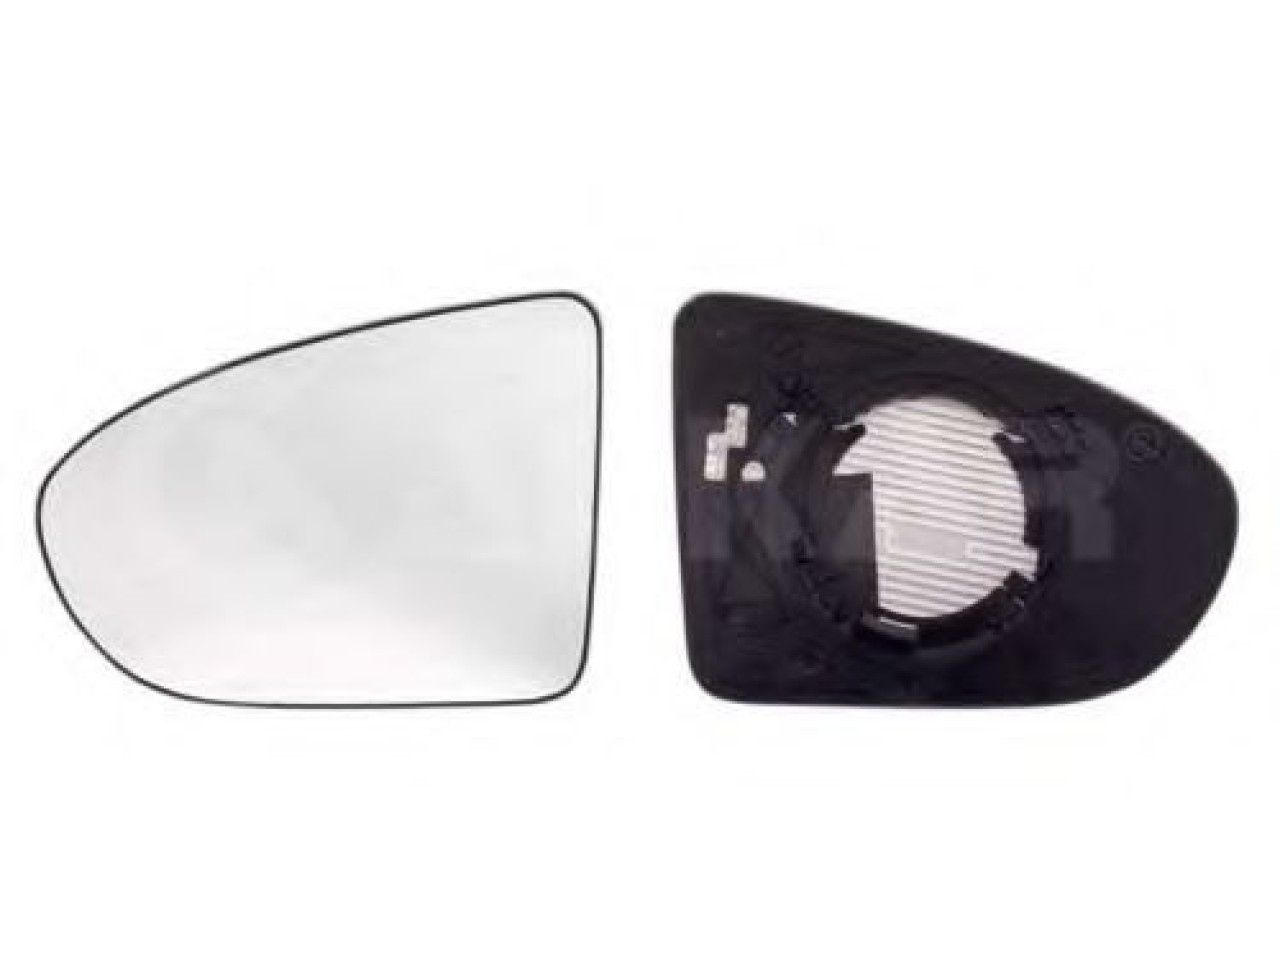 Sticla oglinda, oglinda retrovizoare exterioara NISSAN QASHQAI / QASHQAI +2 (J10, JJ10) (2007 - 2013) ALKAR 6472567 piesa NOUA